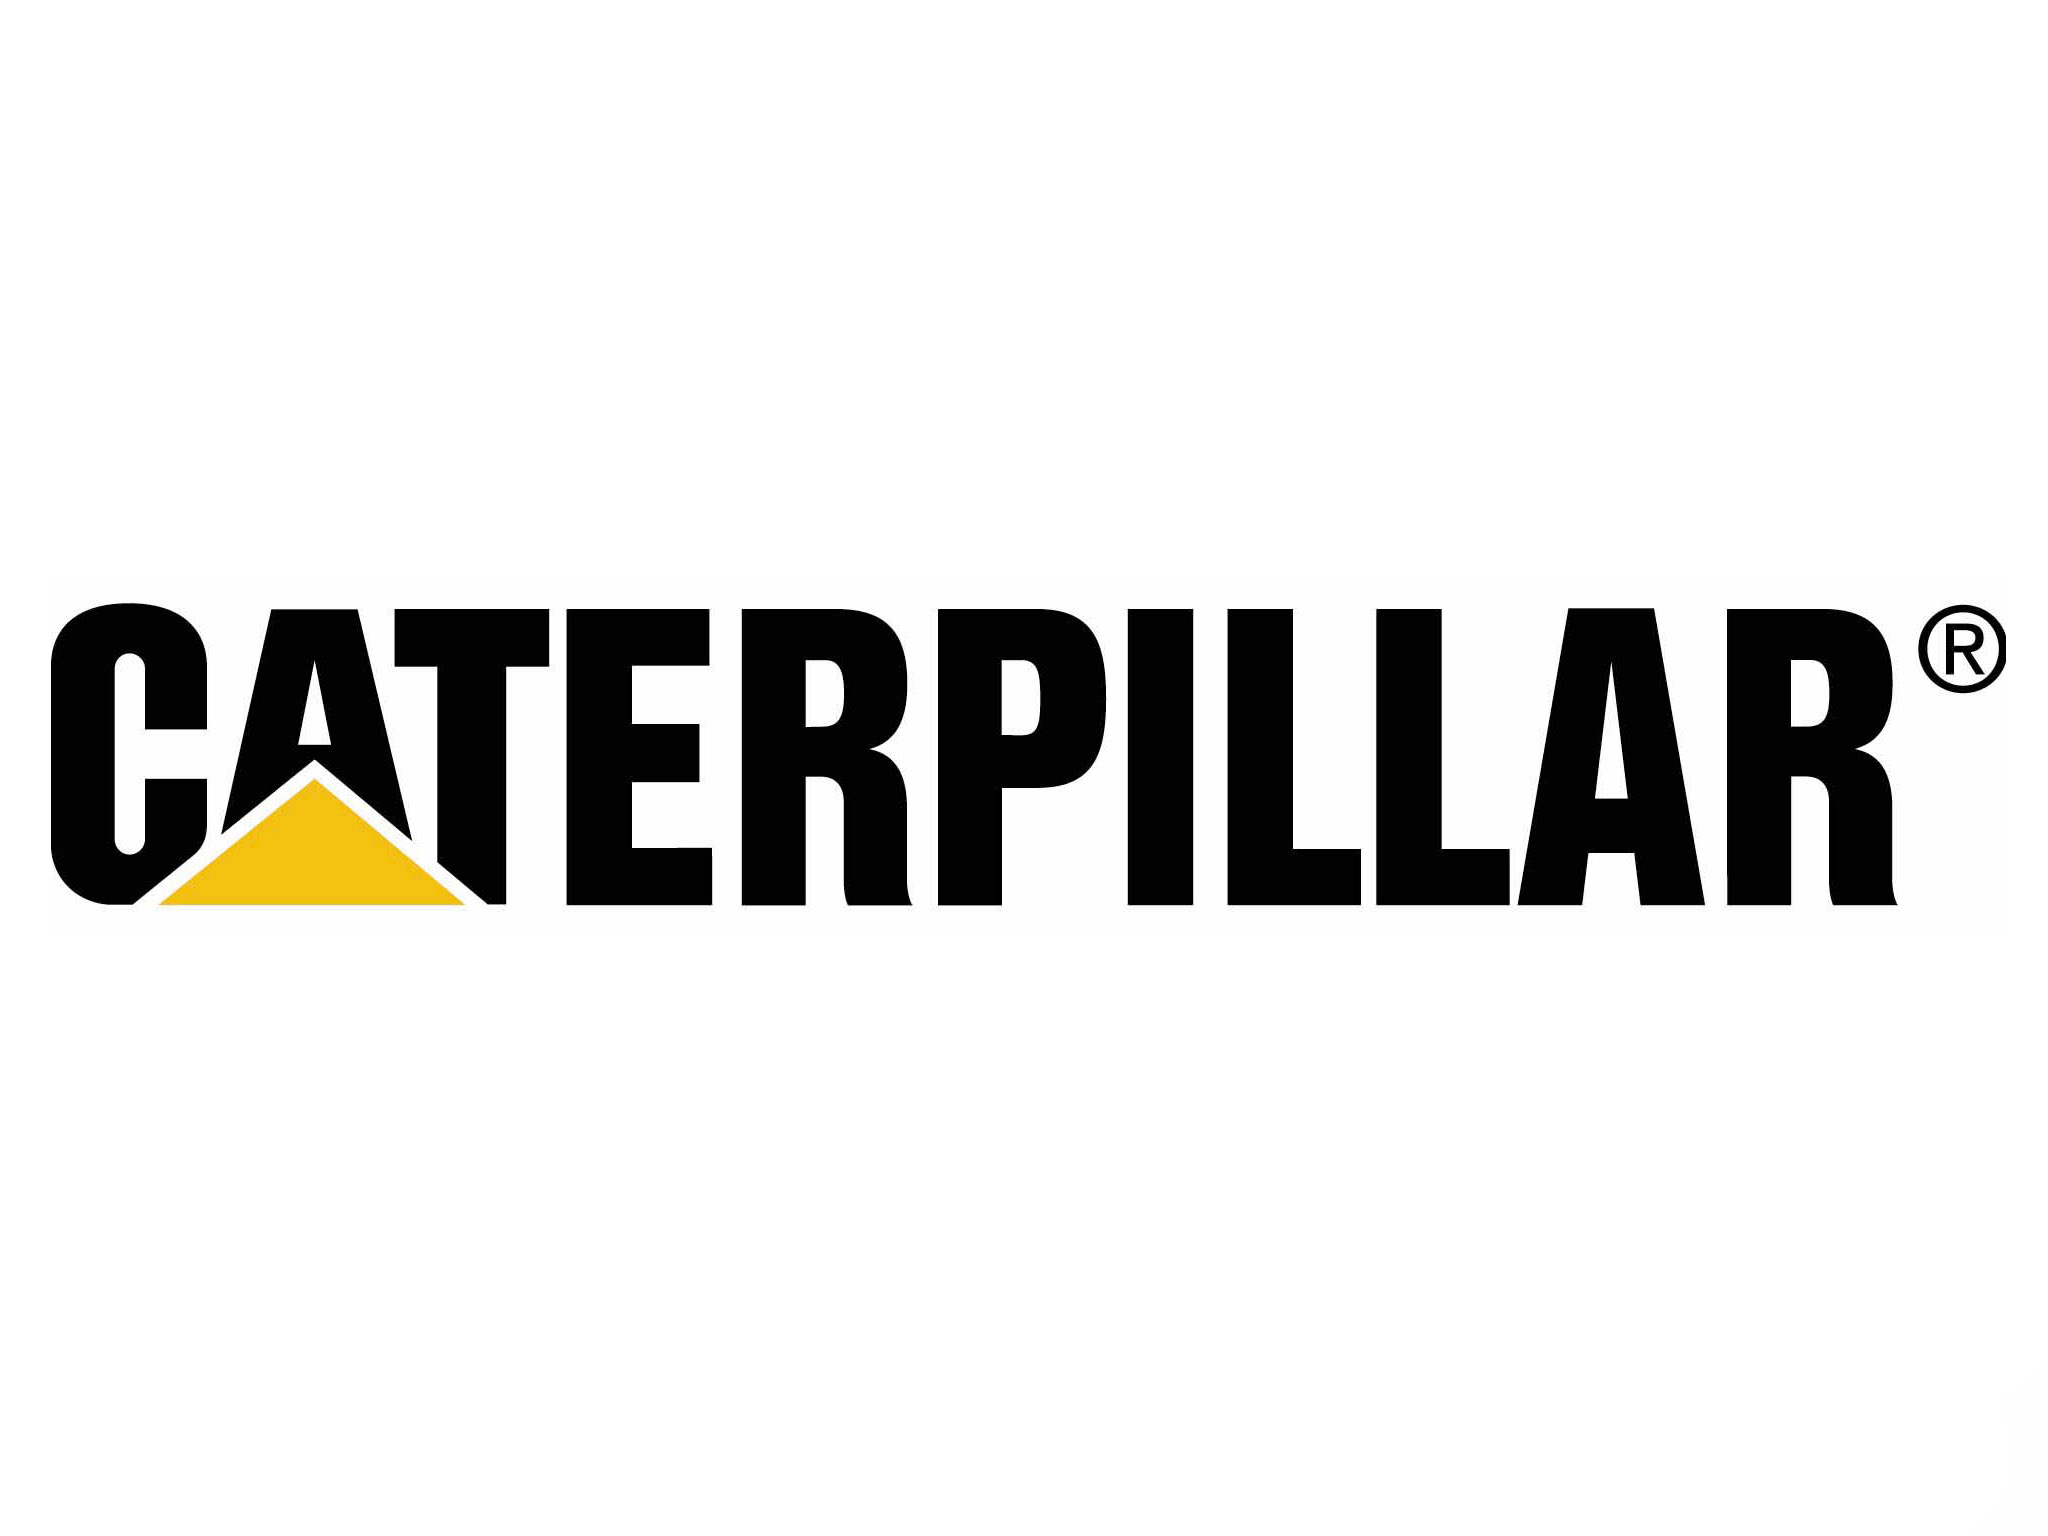 Caterpillar Ventures